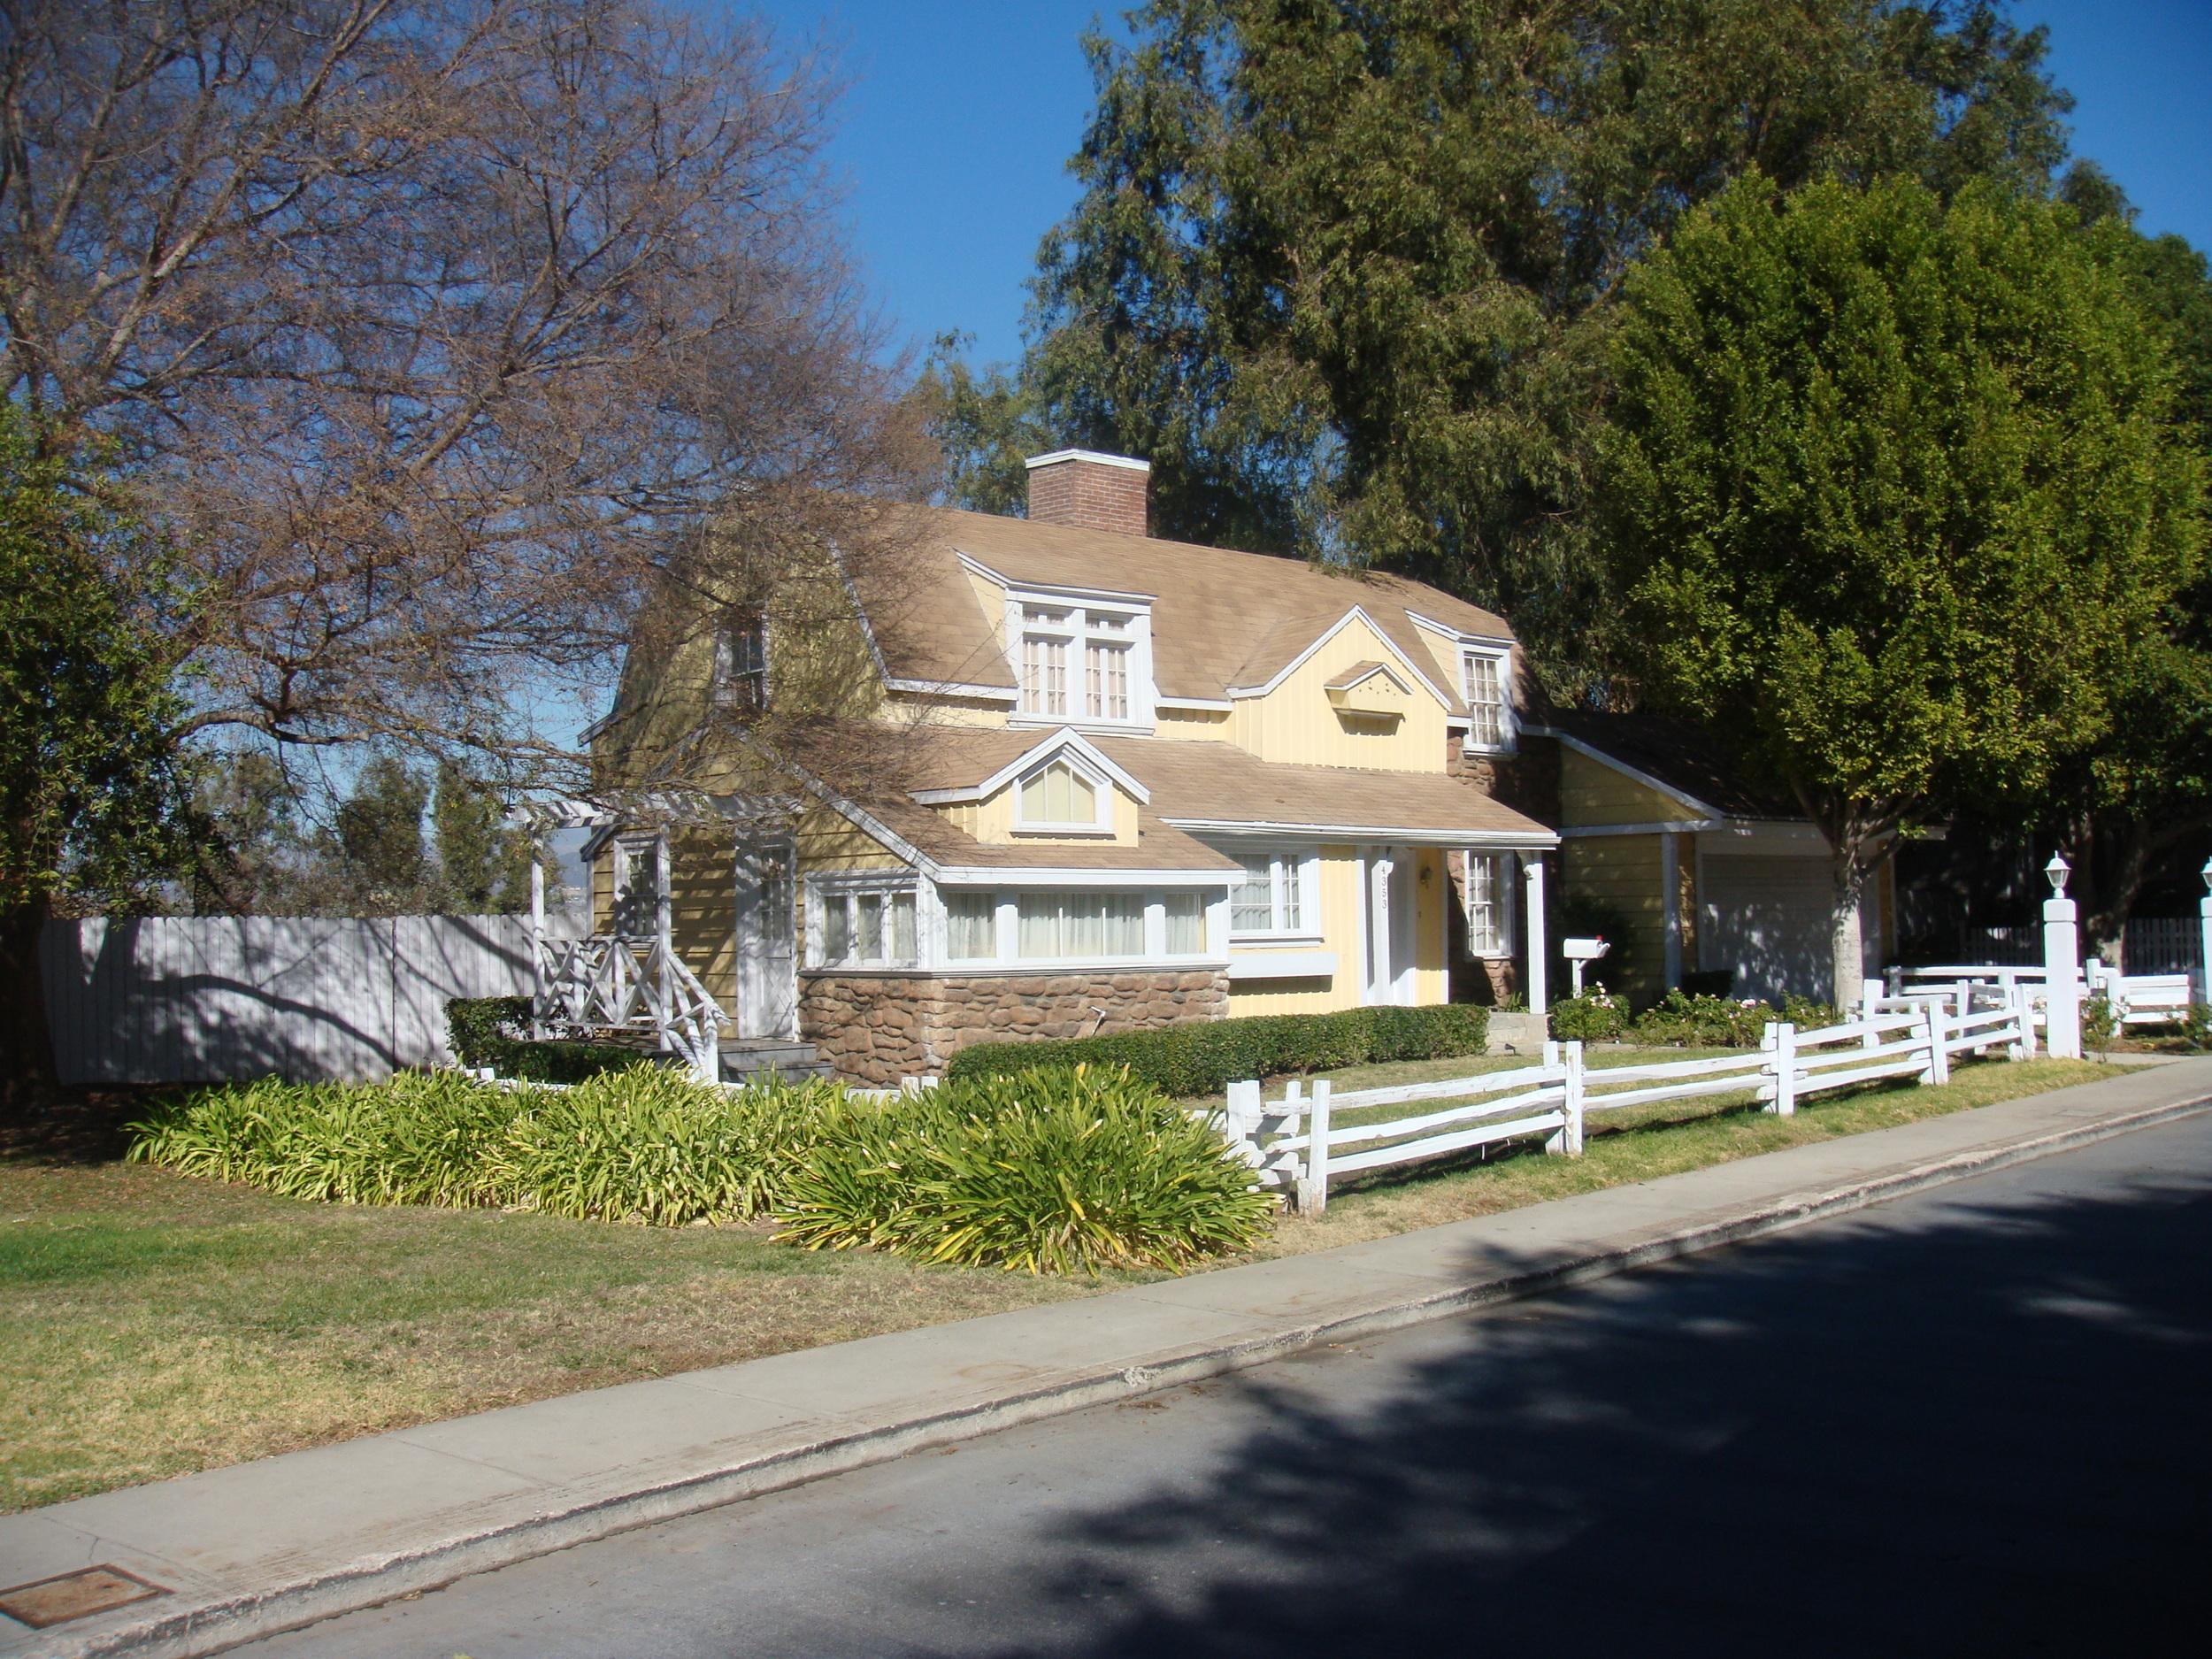 Susan Delfino's House on Wisteria Lane